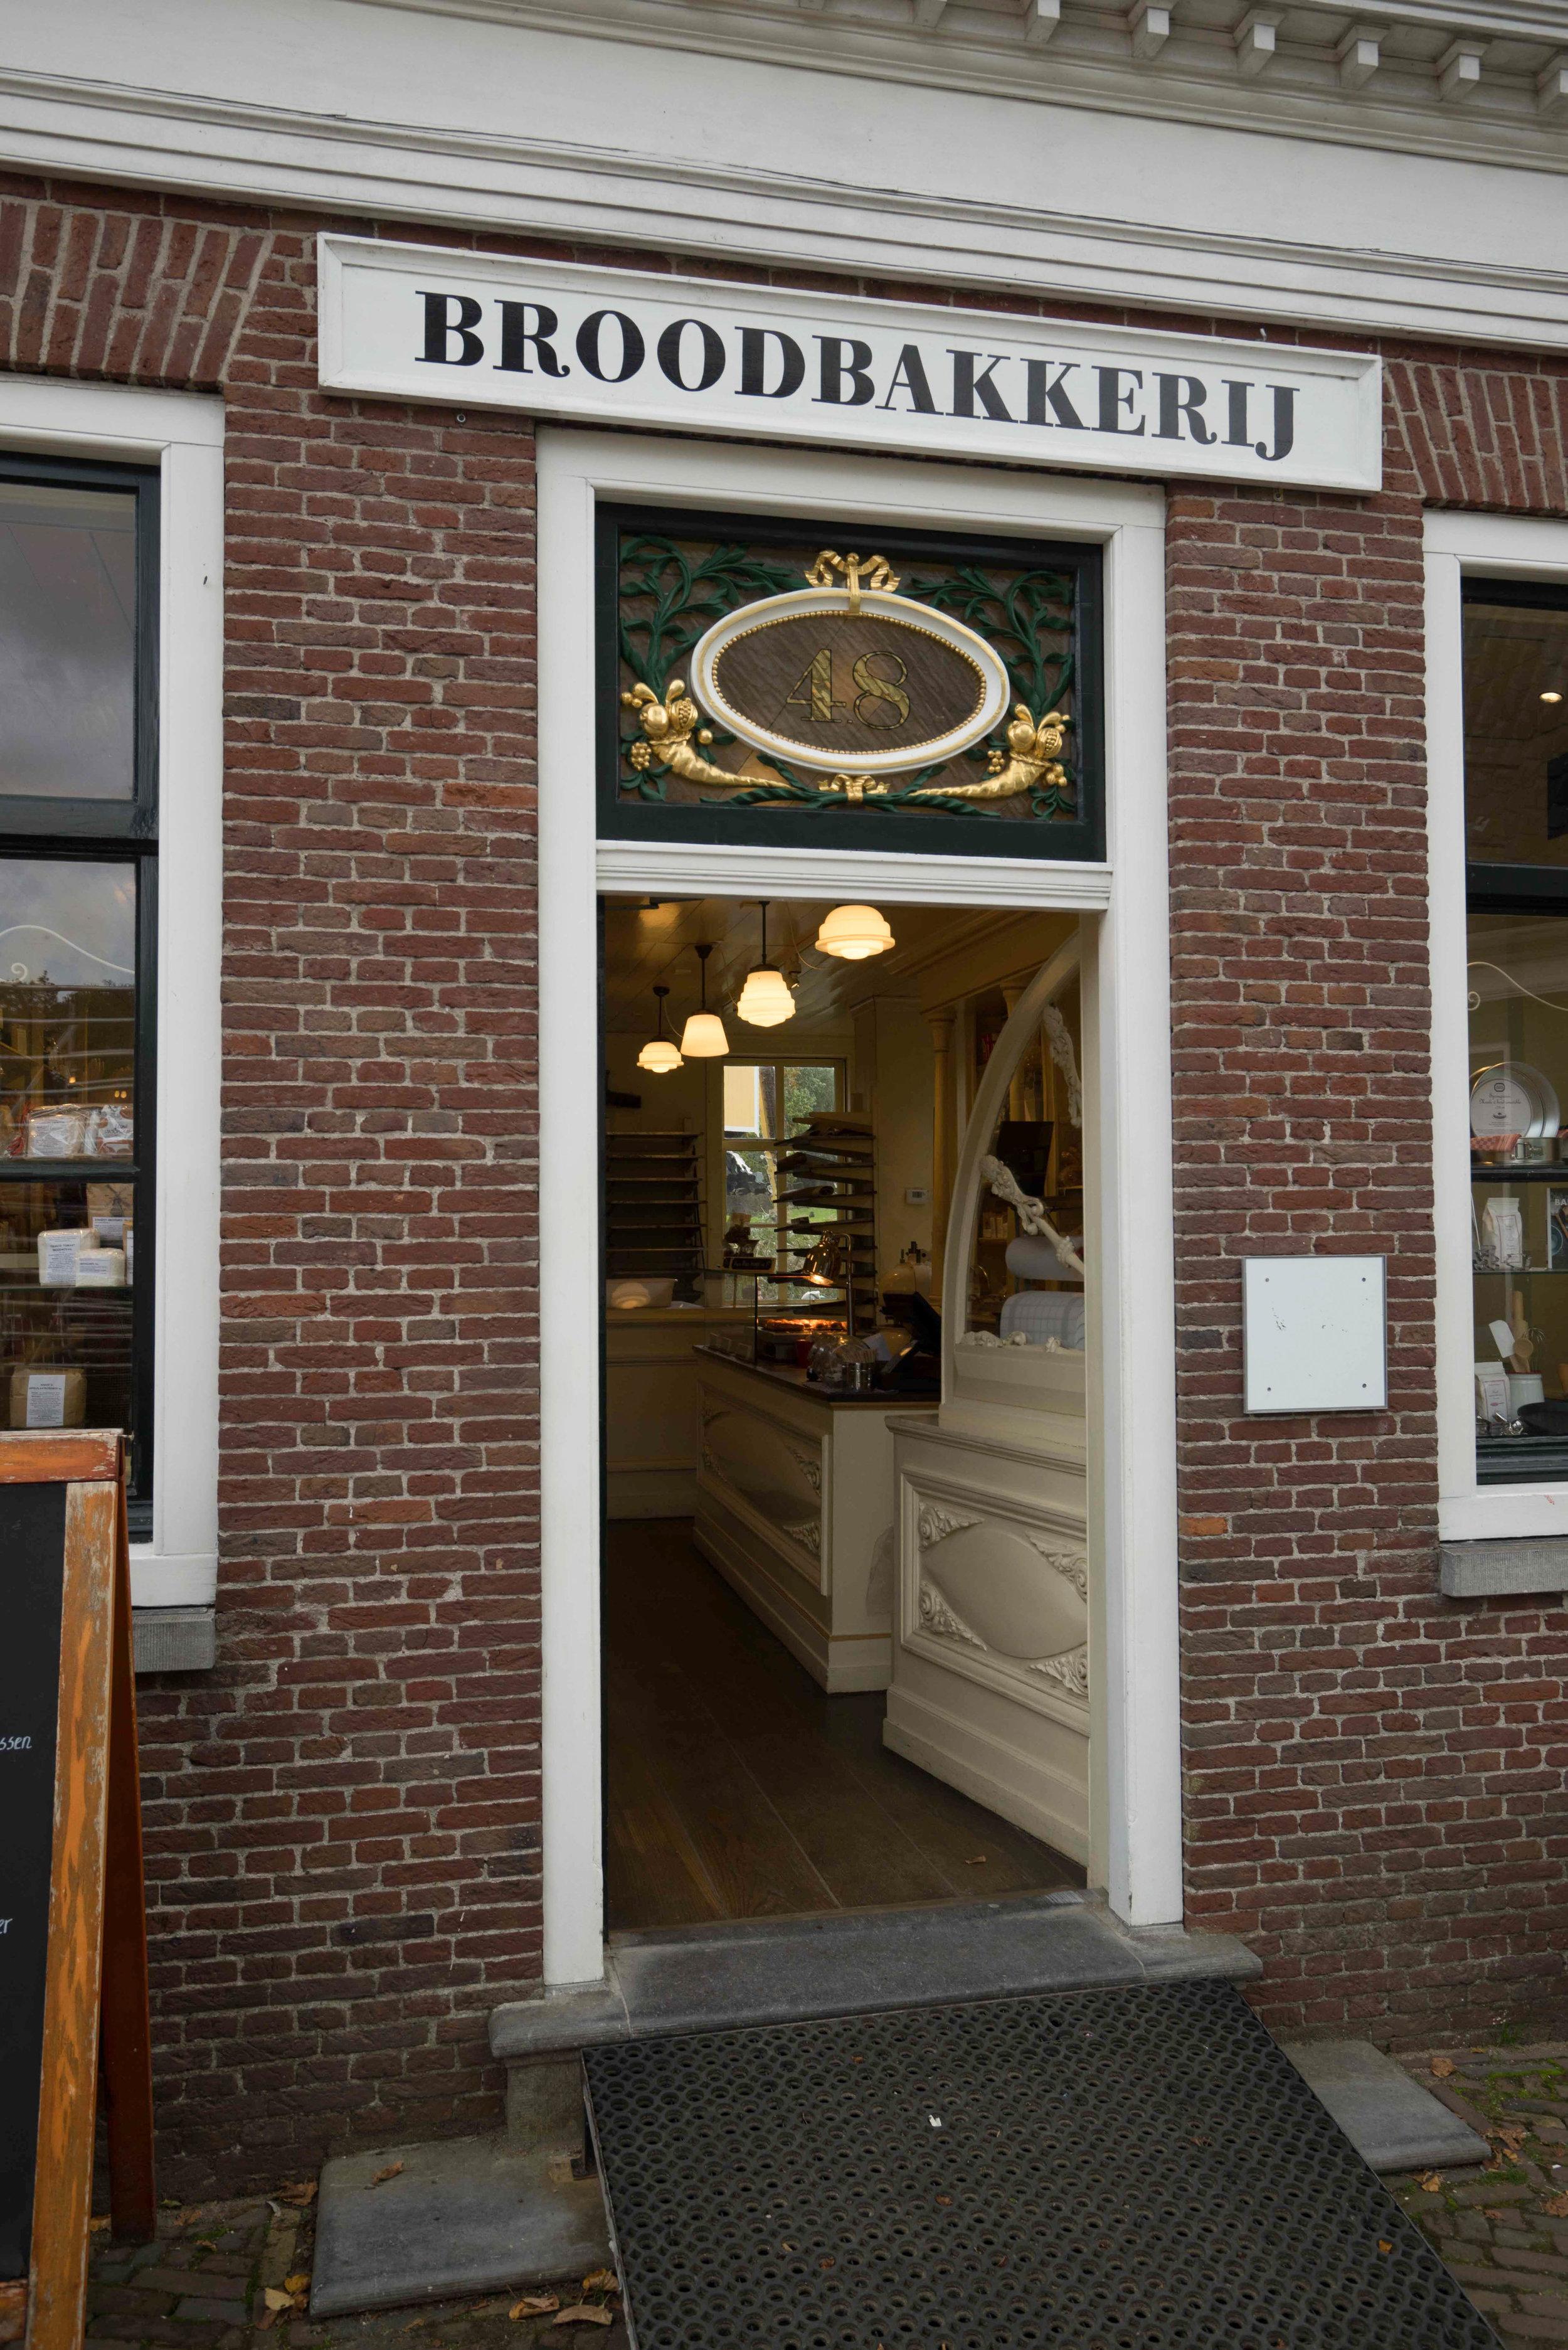 Nederland 10-01-2017 Dev LR-136.jpg